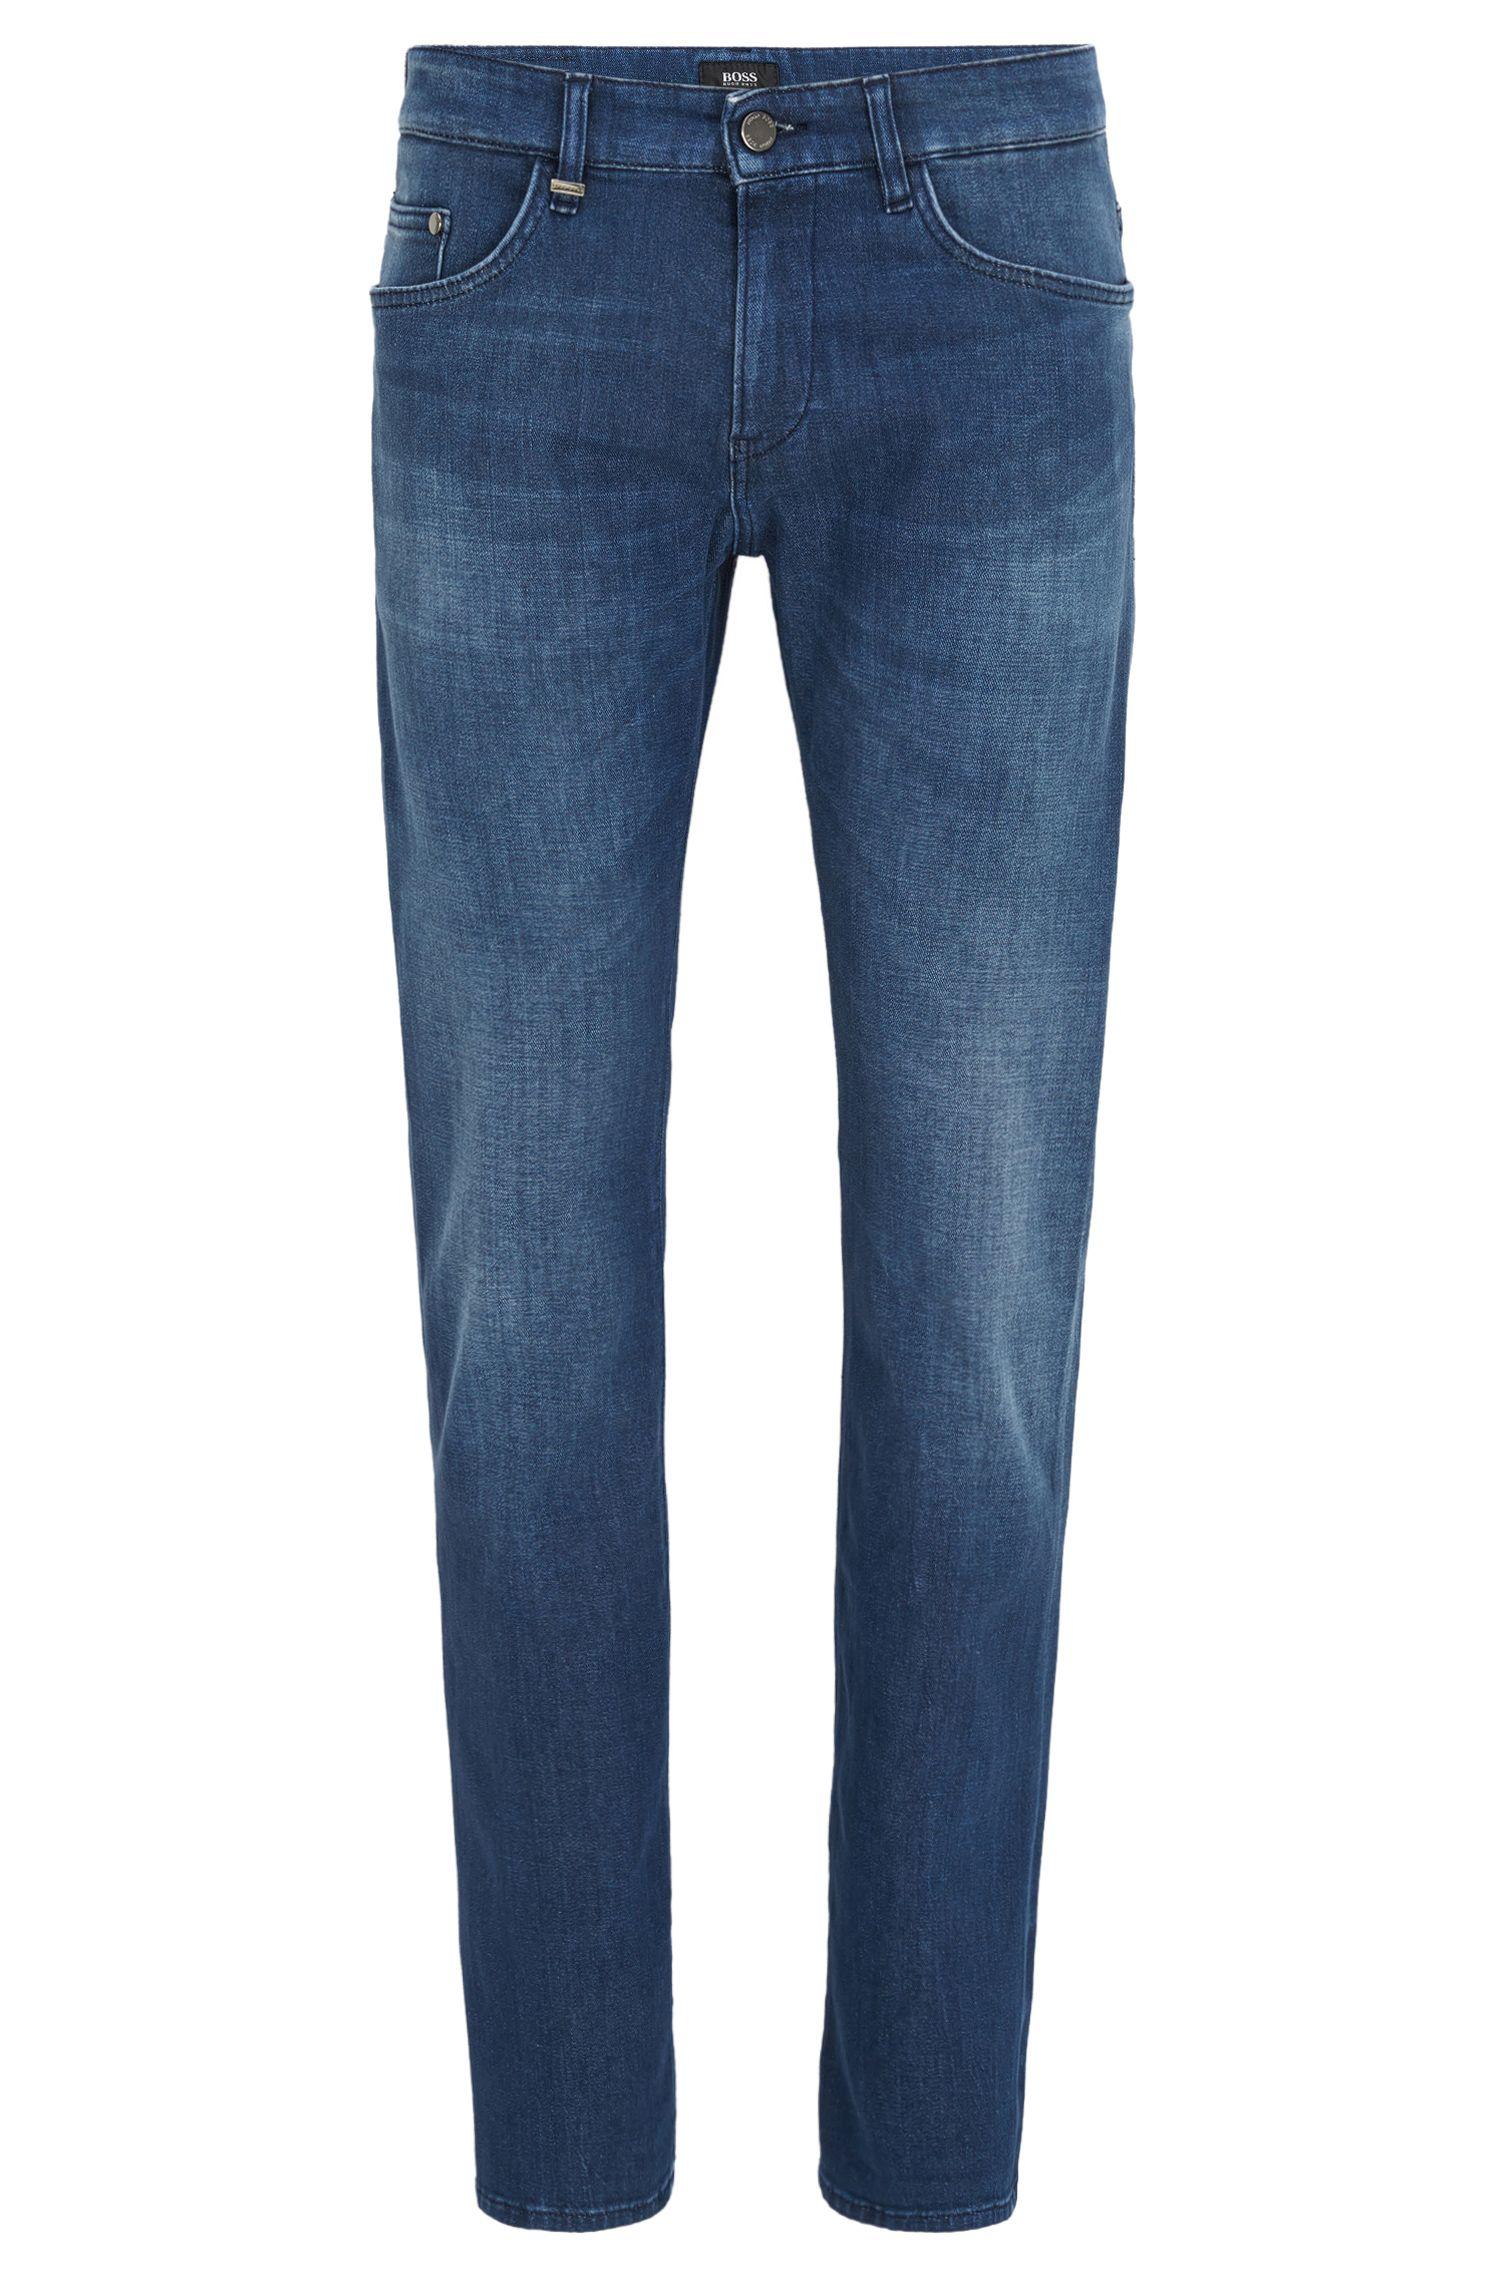 Slim-fit jeans van Italiaans, middelblauw, gewassen stretchdenim